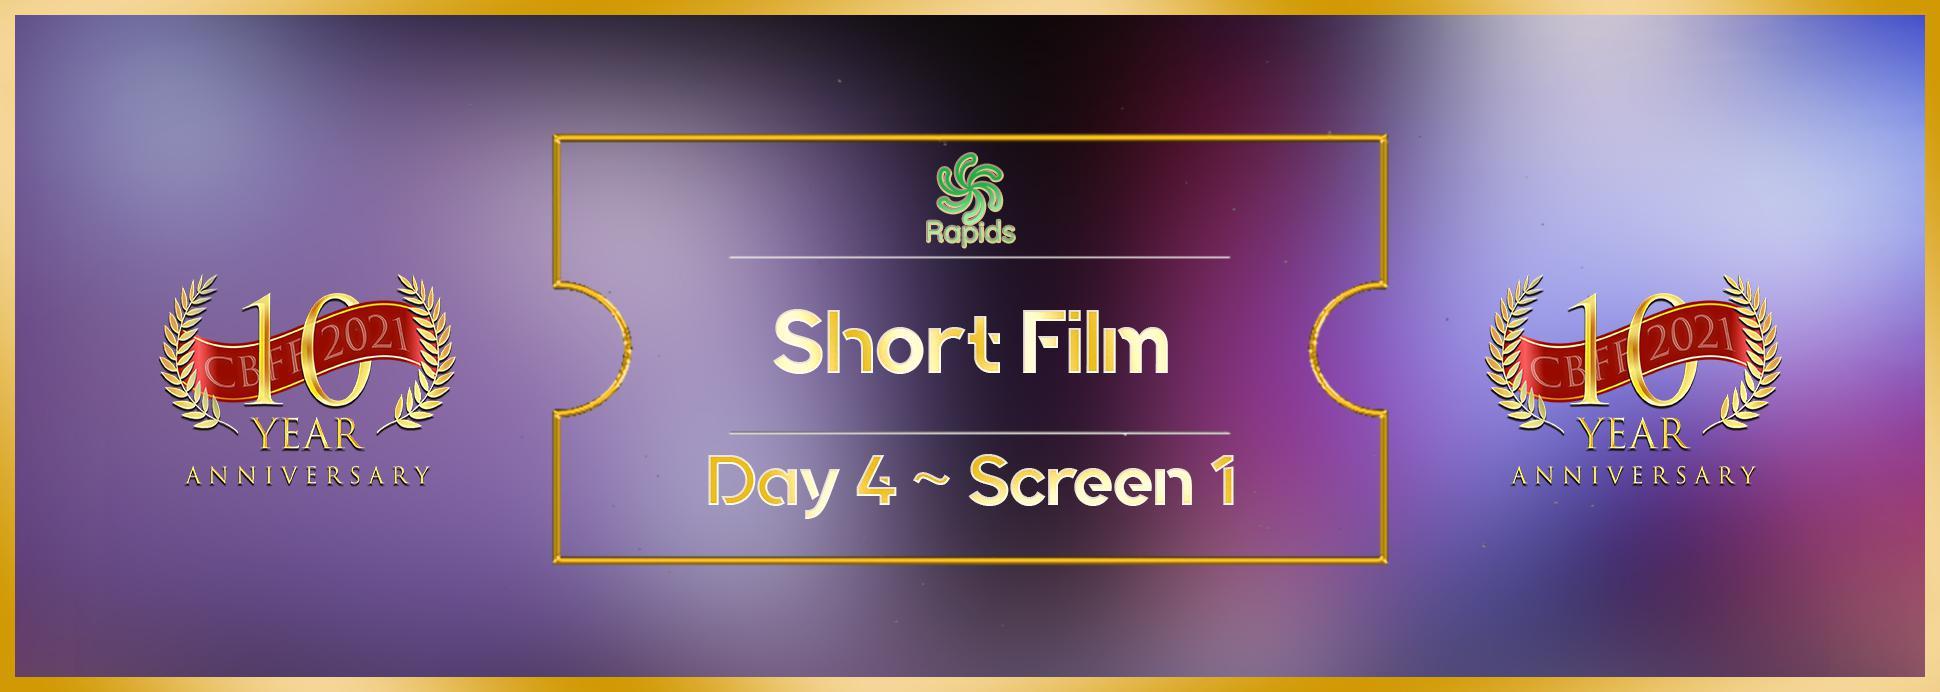 Day 4, Screen 1: Short Film 2